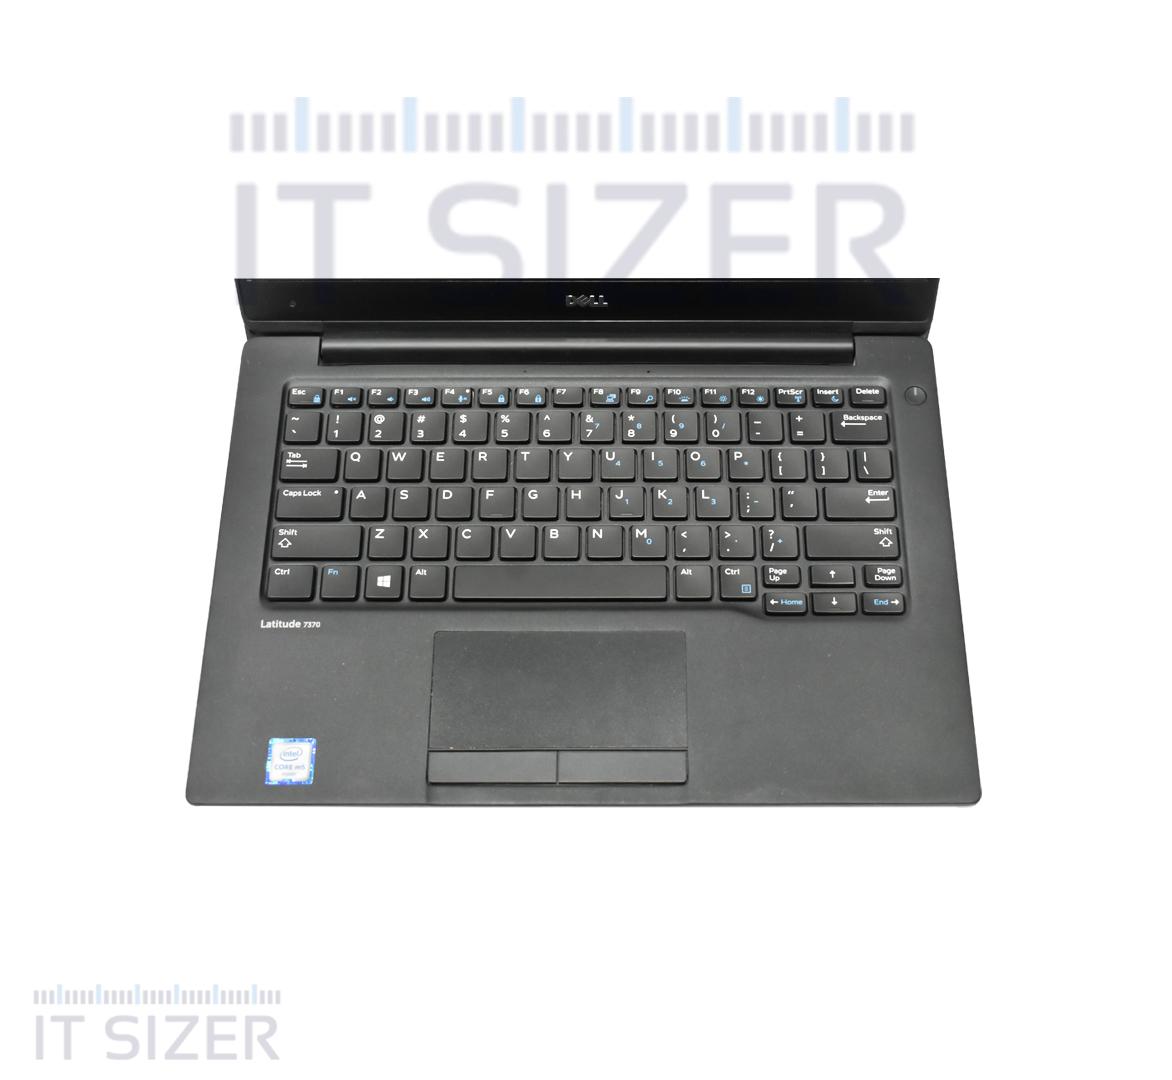 Dell Latitude 7370 Business Laptop, Intel Core i5-6Y57 CPU, 8GB DDR3 BUILTIN RAM, 256GB SSD M2, 13 inch Display, Windows 10 Pro (Renewed)